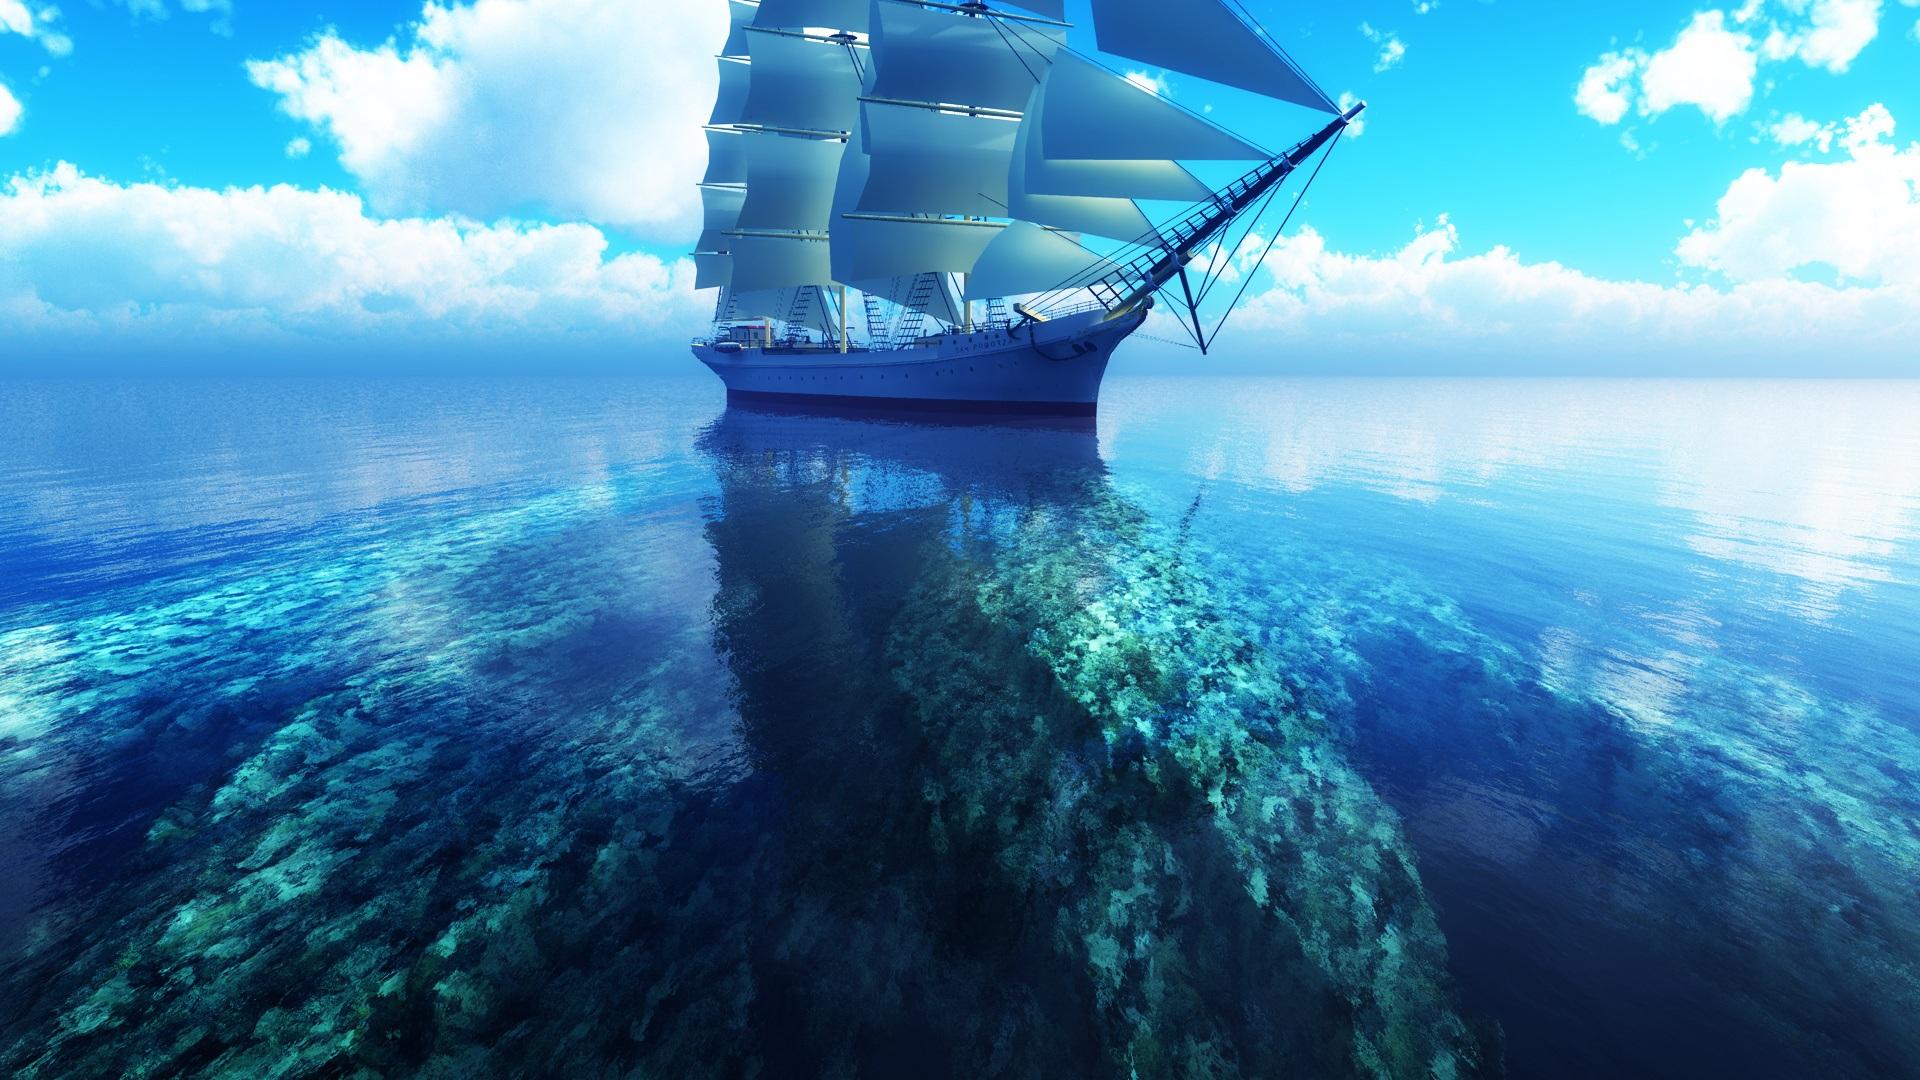 wallpaper 3d sailboat blue sea 1920x1200 hd picture, image